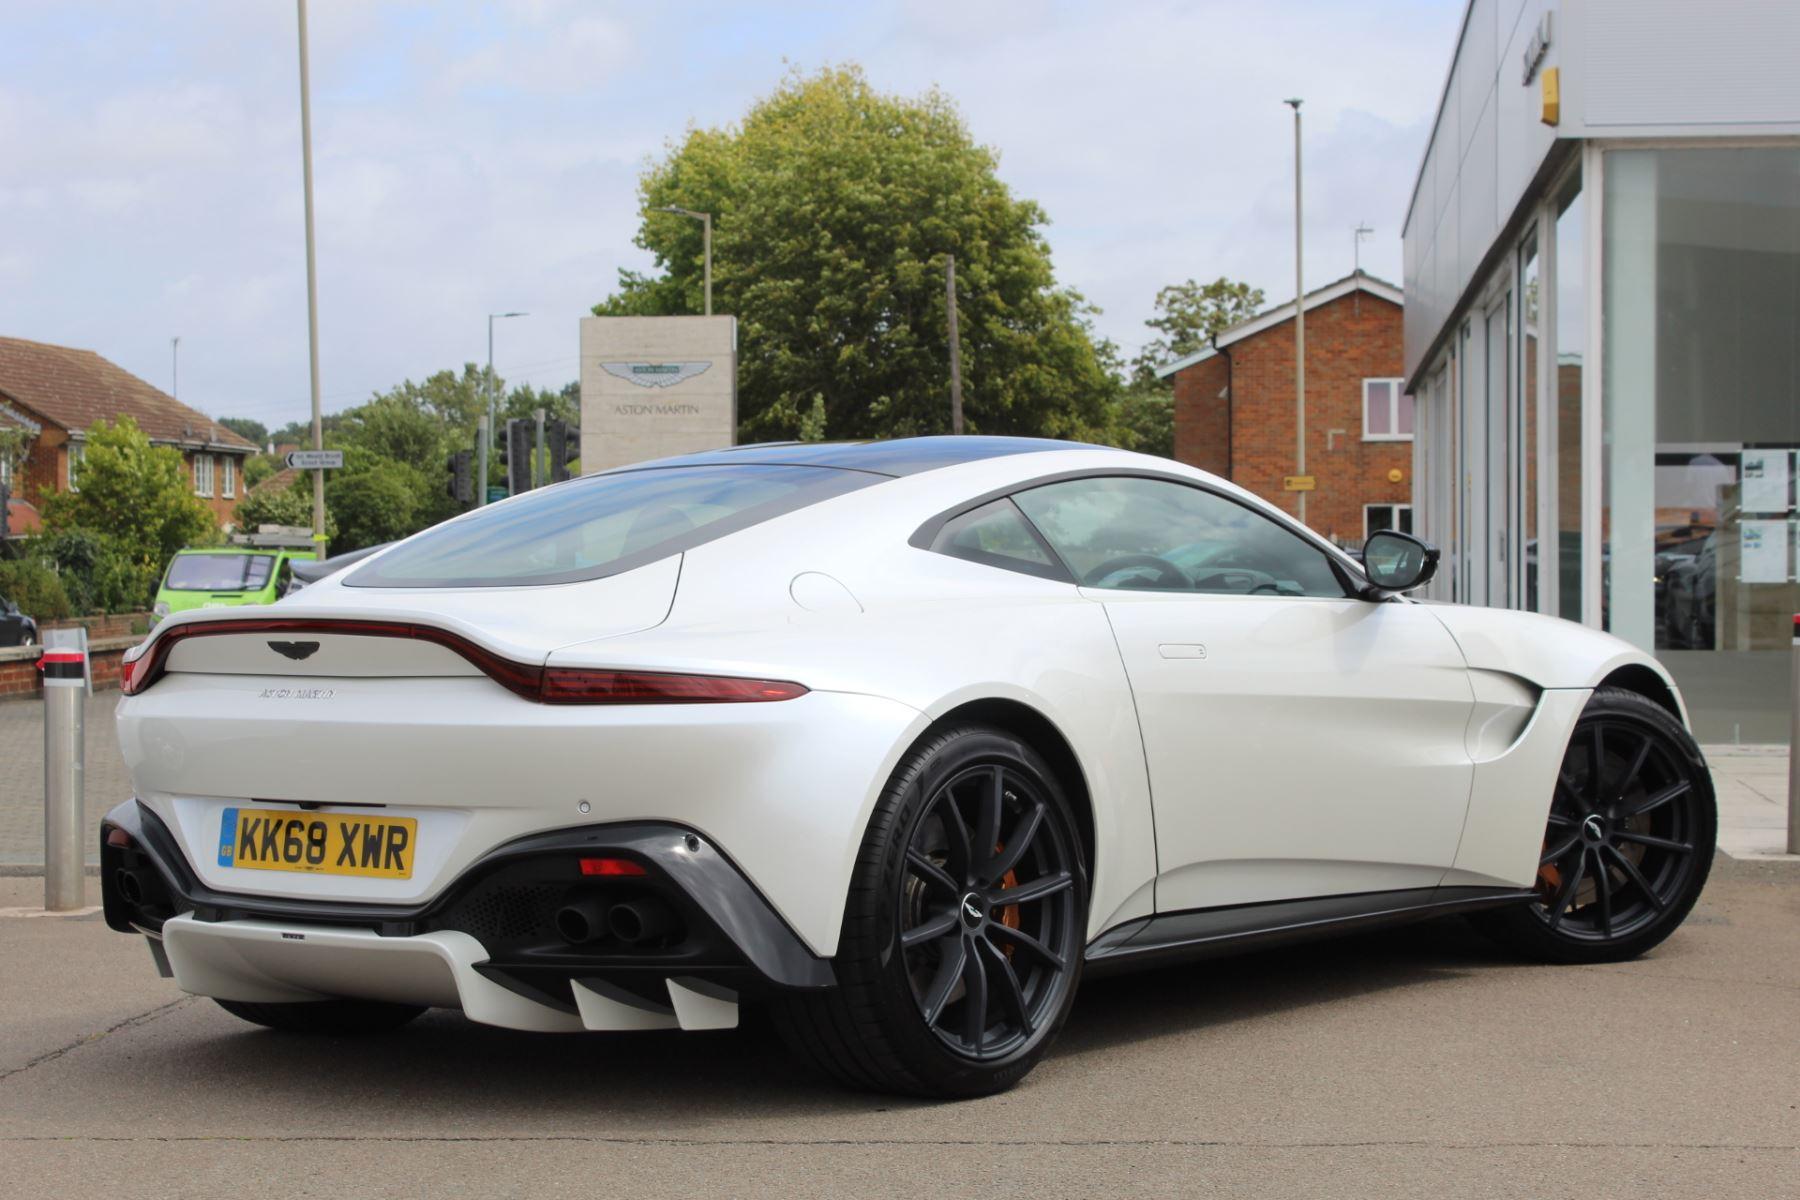 Aston Martin New Vantage 2dr ZF 8 Speed image 16